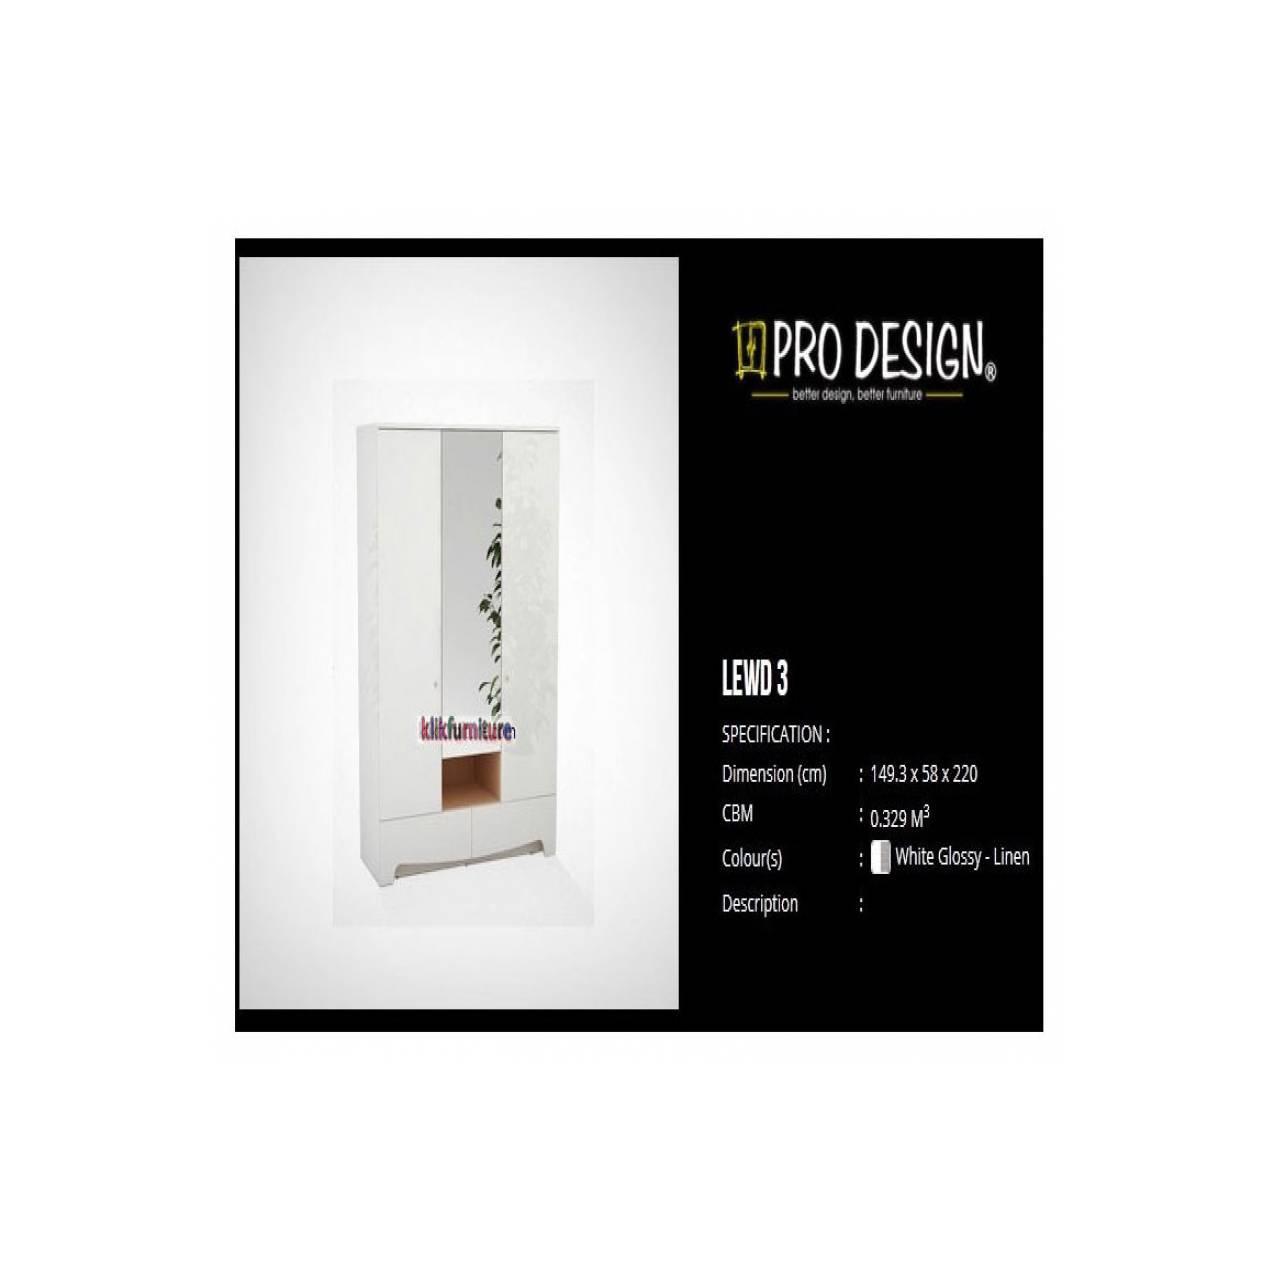 Pro Design Legia Lemari Pakaian 4 Pintu 3 Laci White Glossy Linen Brico Meja Tamu 120 Sanremo Light Black Khusus Jawa